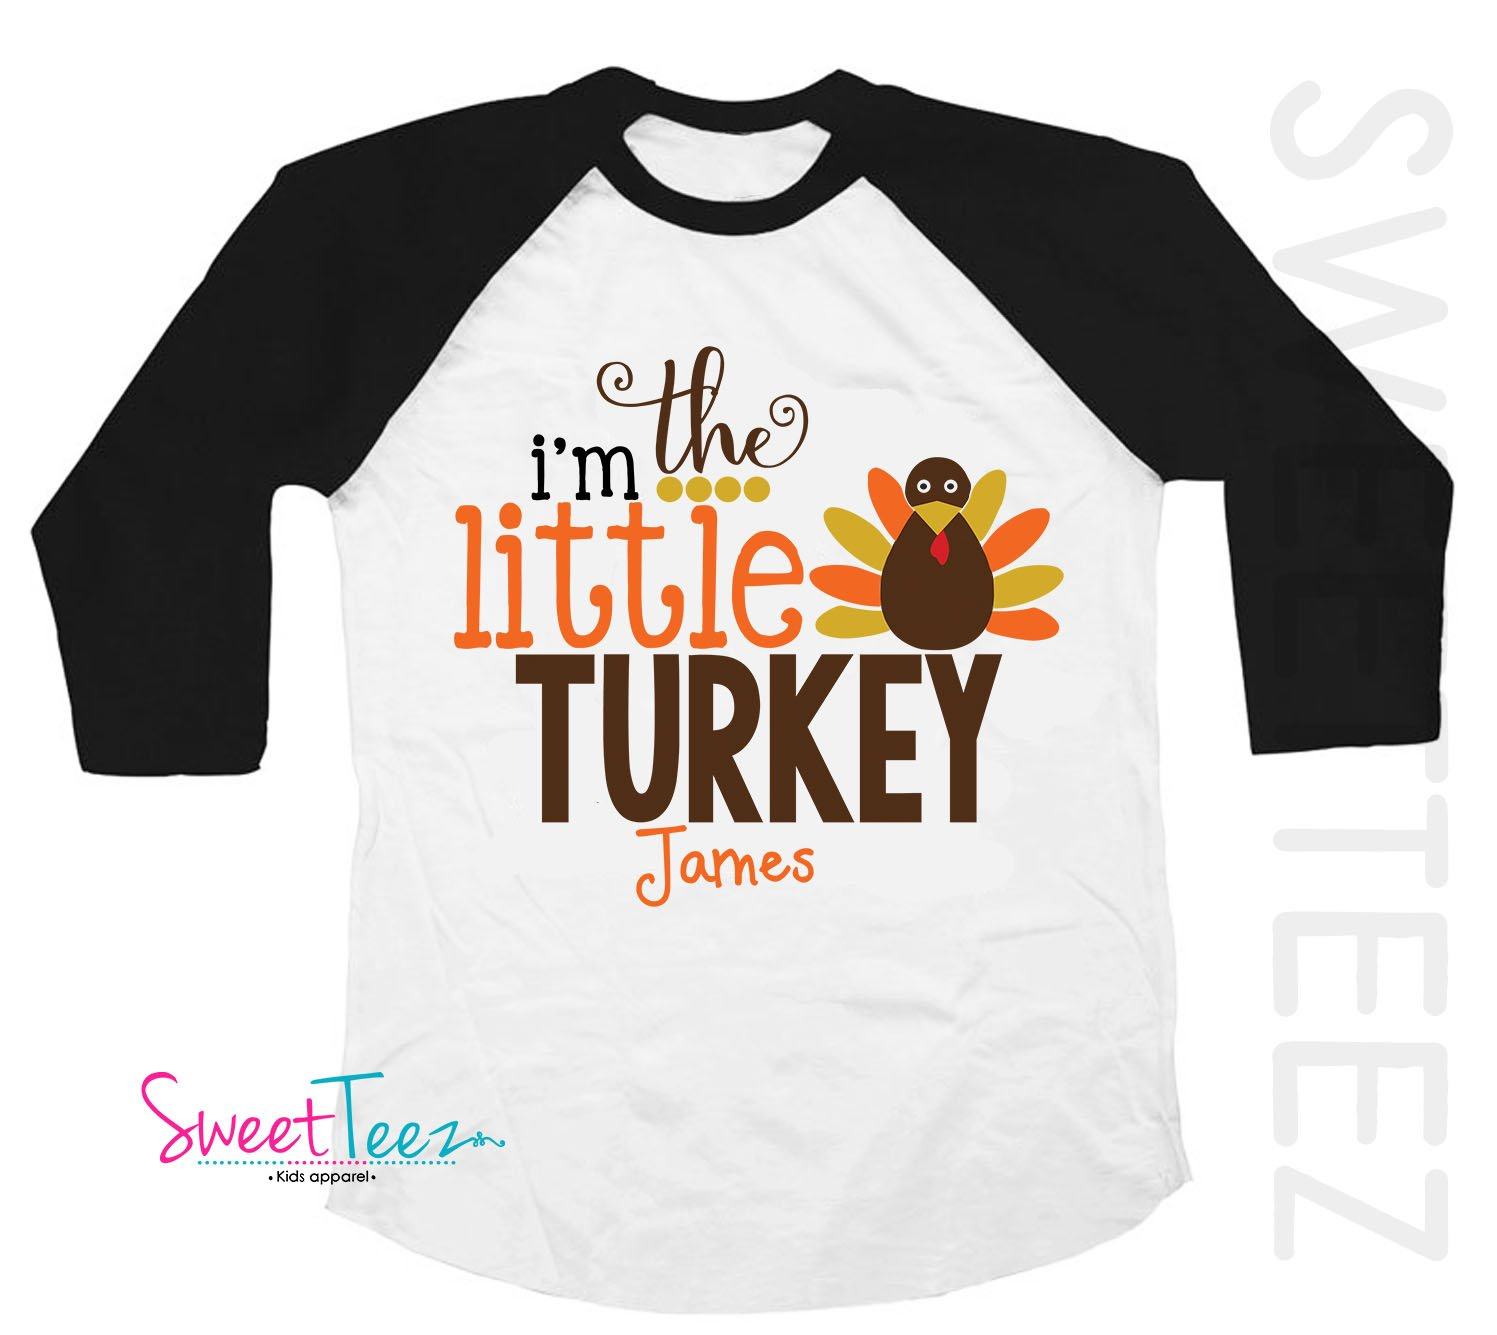 Little Turkey Shirt Personalized Big Turkey Shirt Black Sleeve Raglan Shirt Handmade for Thanksgiving